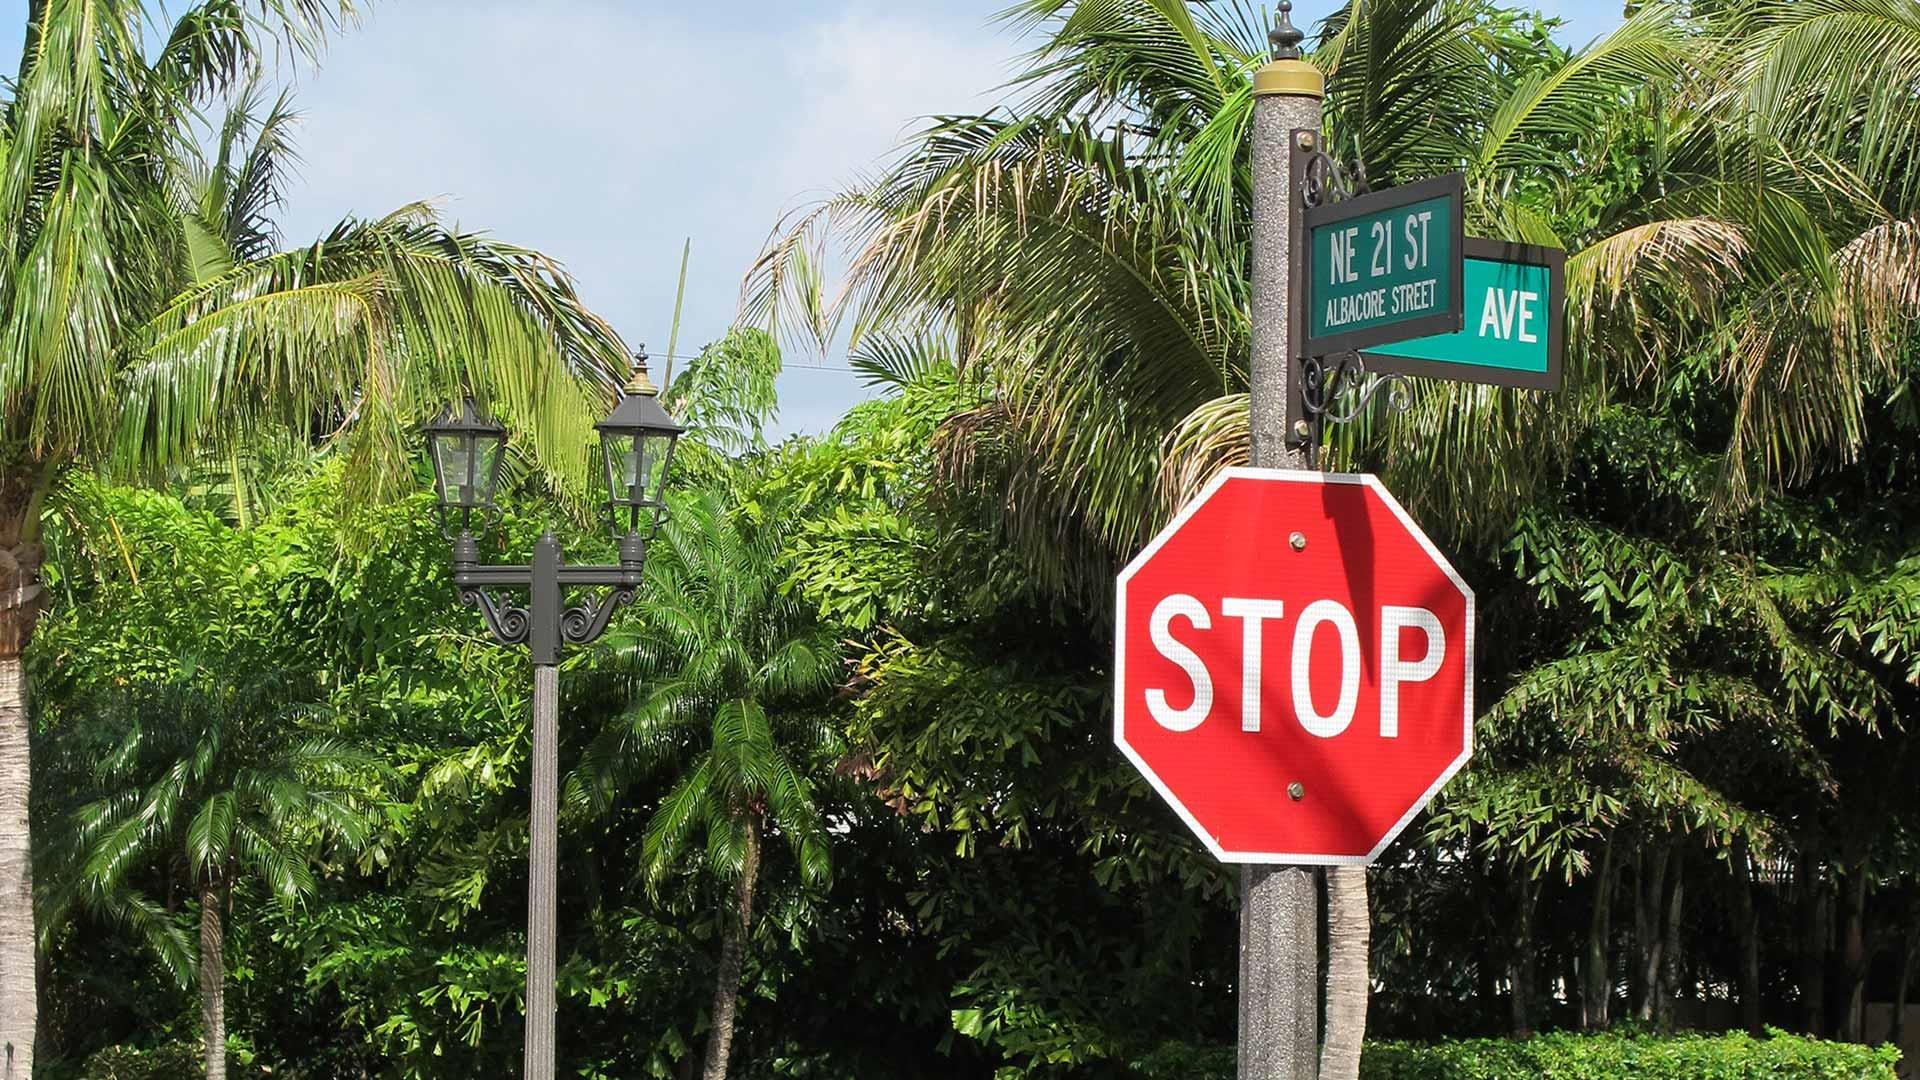 Street Sign Pole